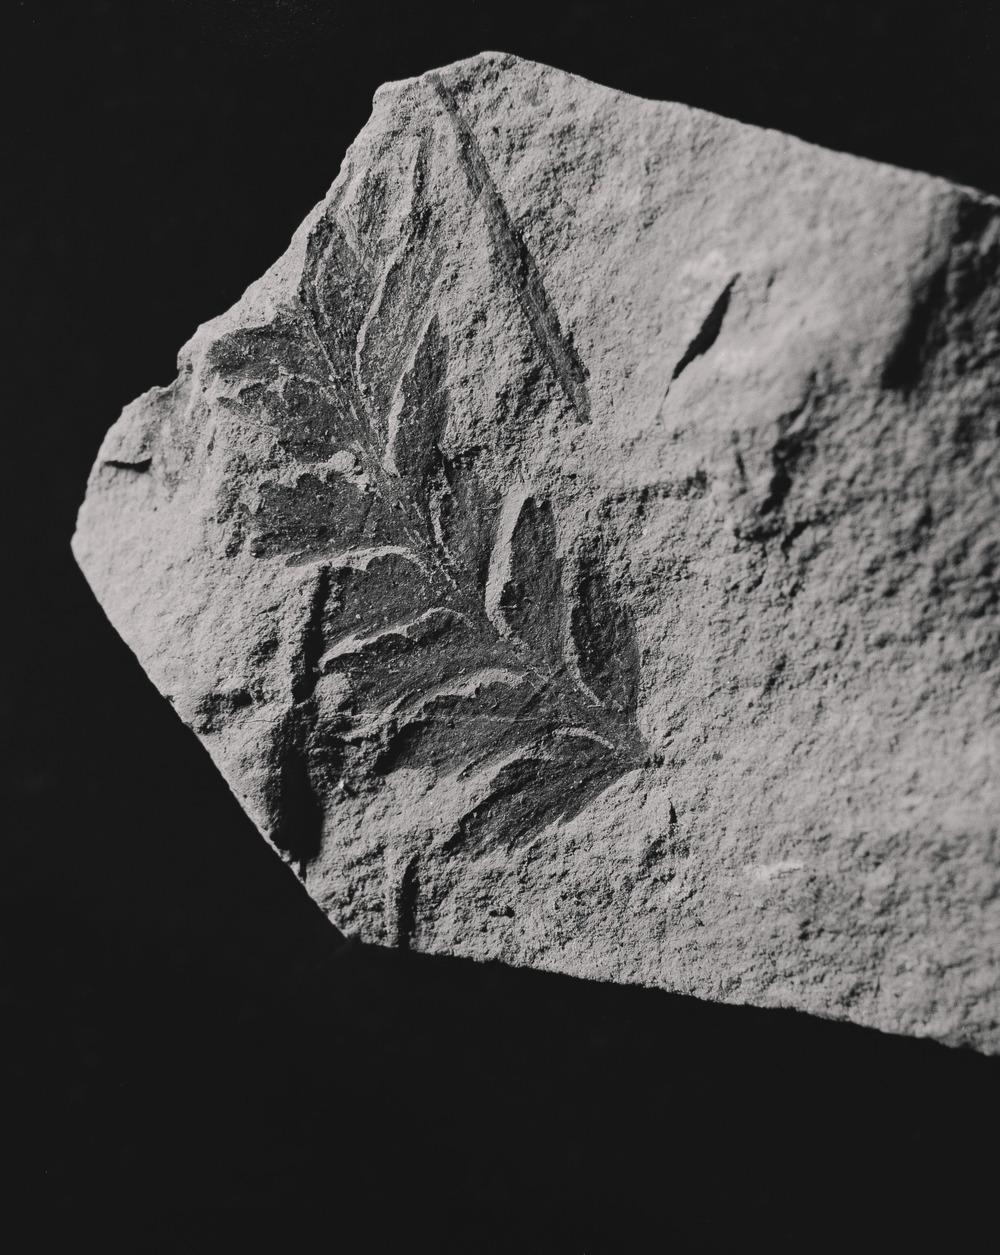 Casey Moore Natures Negatives Fossils-16.jpg